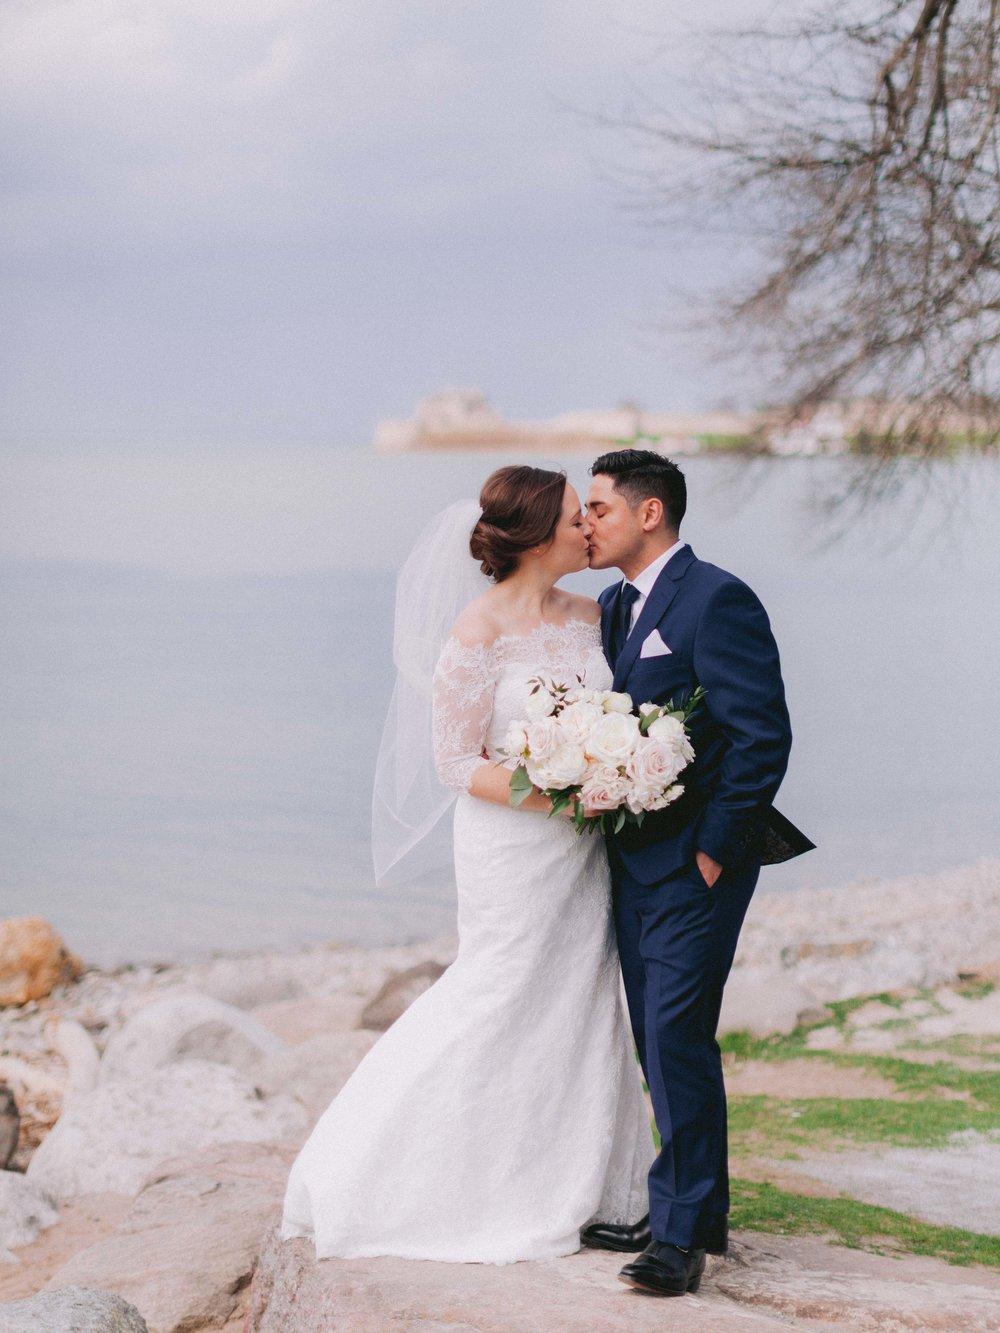 Niagara_on_the_lake_spring_wedding_kurtz_orpia_toronto_Vineyard_wedding_fine_art (58 of 92).jpg